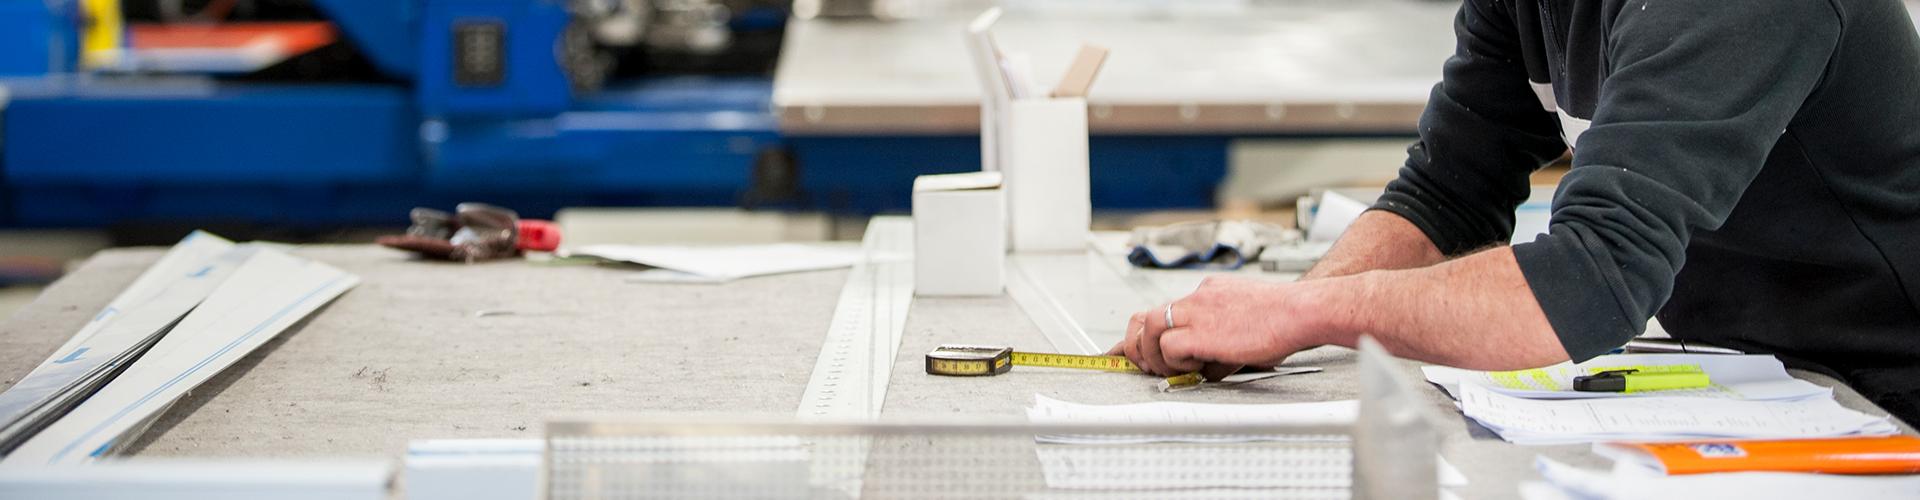 SPENLE door manufacturing workshop for professionals